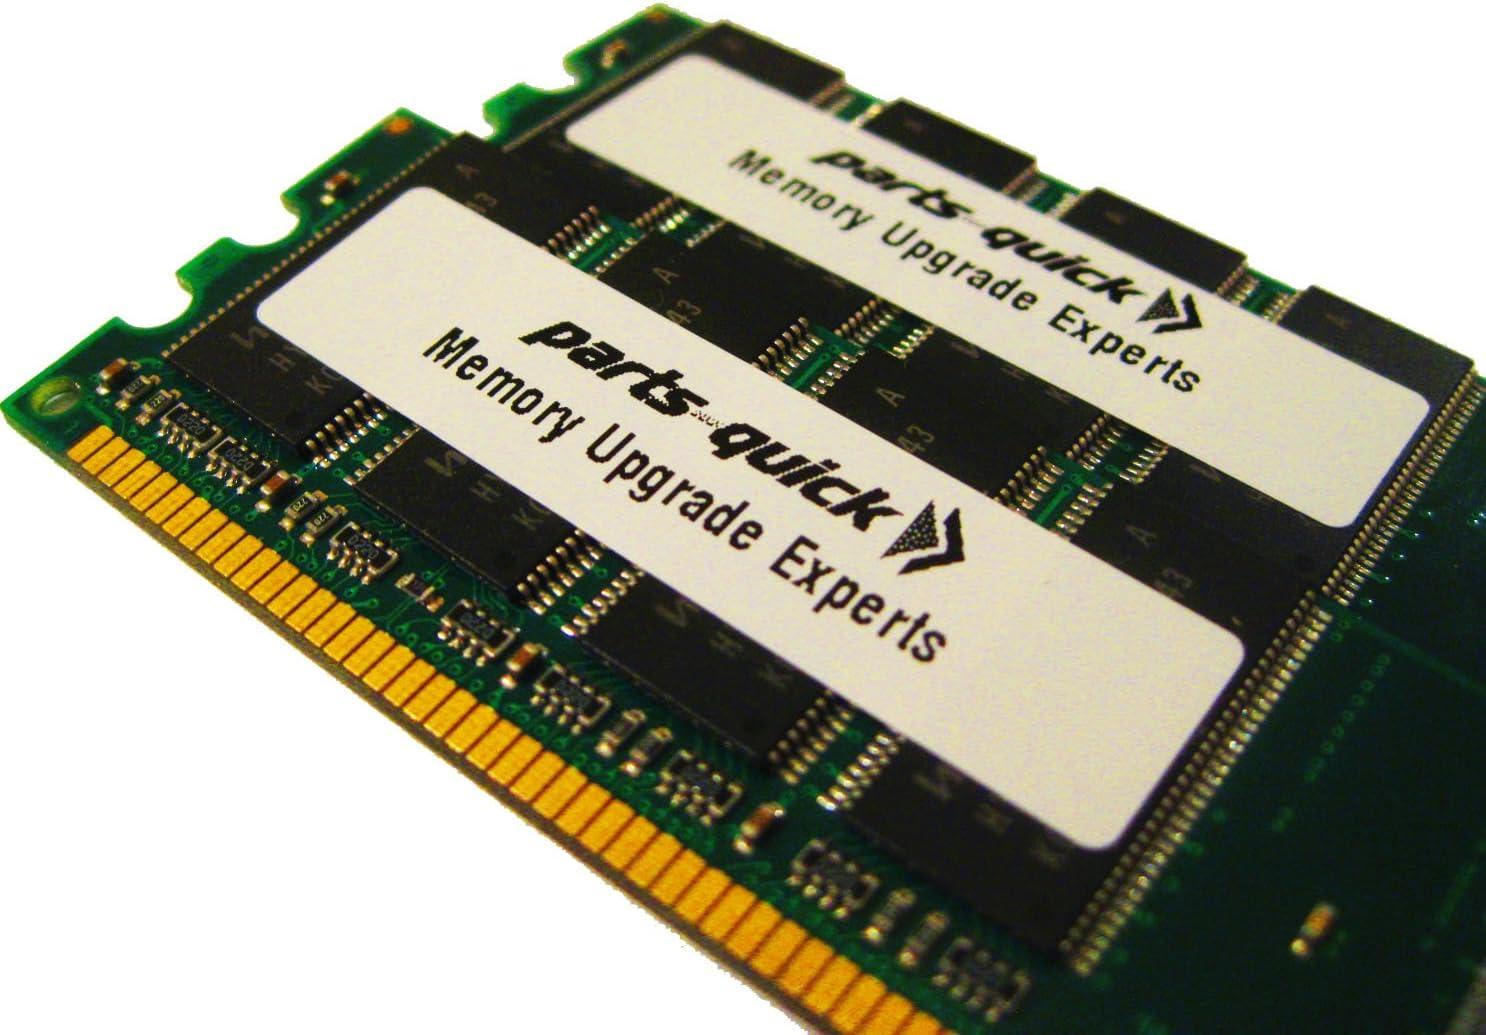 2GB KIT (1GB X 2) Memory Upgrade for Dell Inspiron 640m DDR2 PC2-5300 200 pin 667MHz SO-DIMM NON-ECC (PARTS-QUICK BRAND)